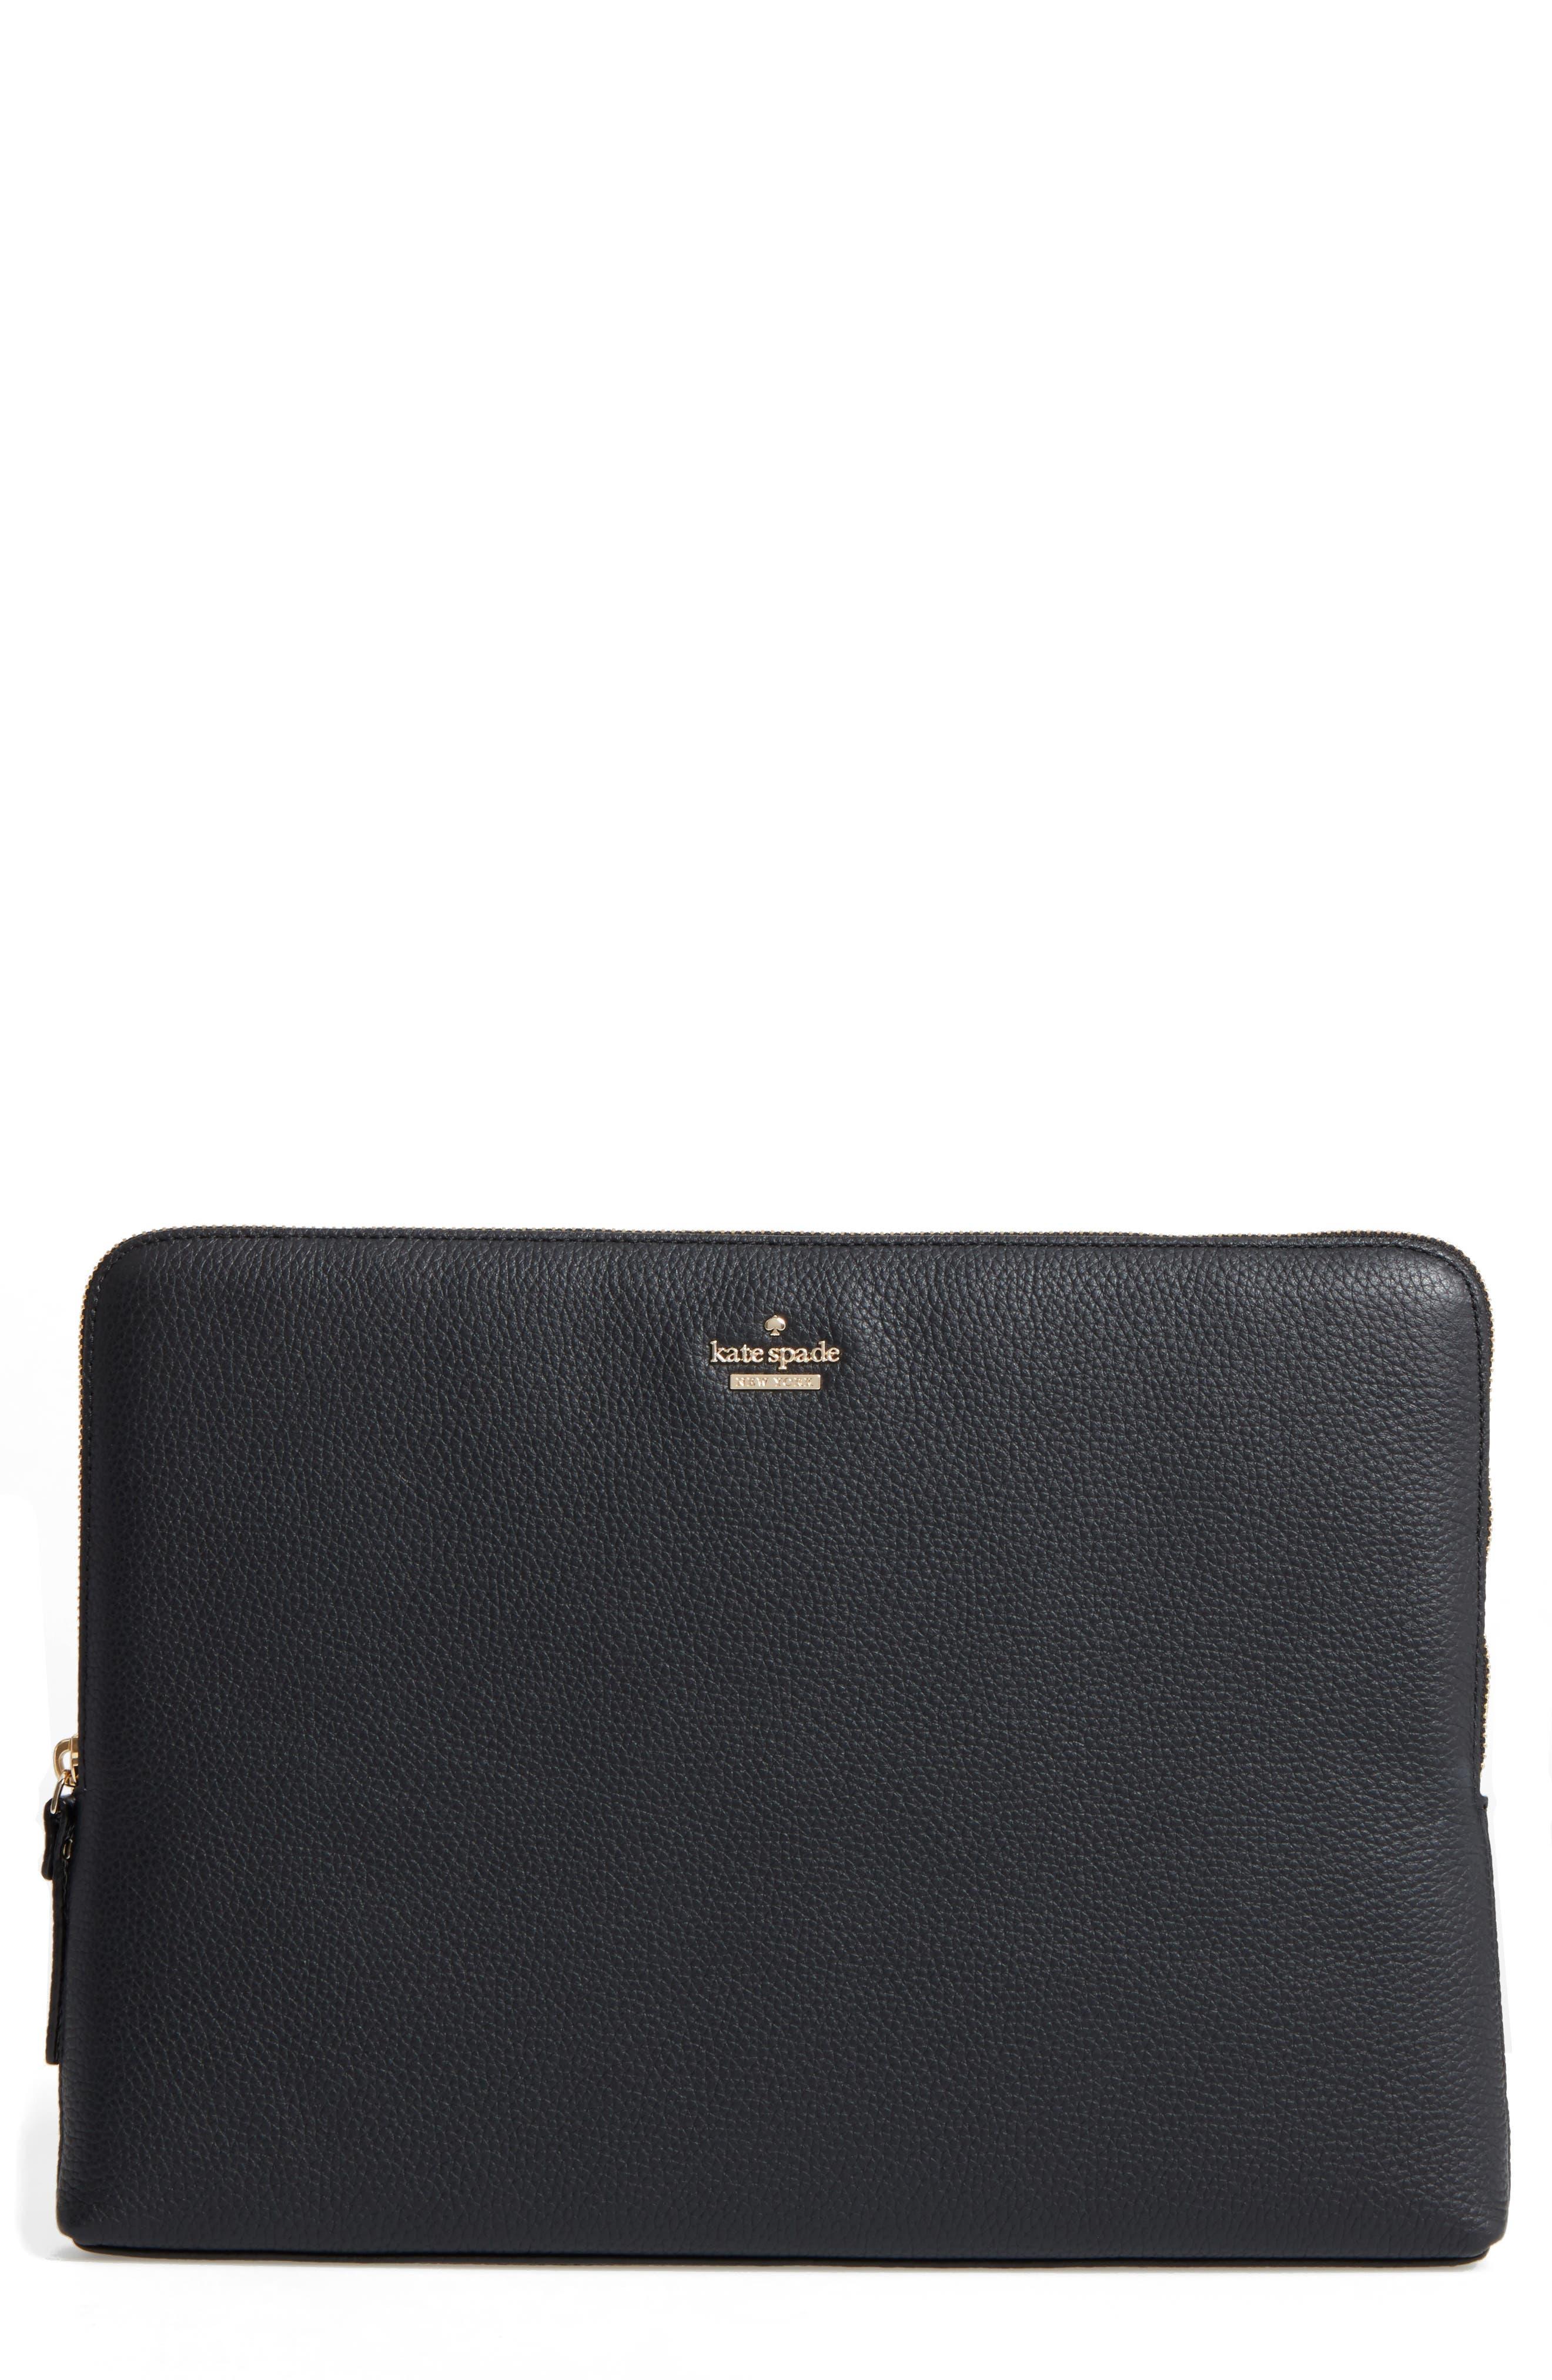 Kate Spade New York Women S Bags